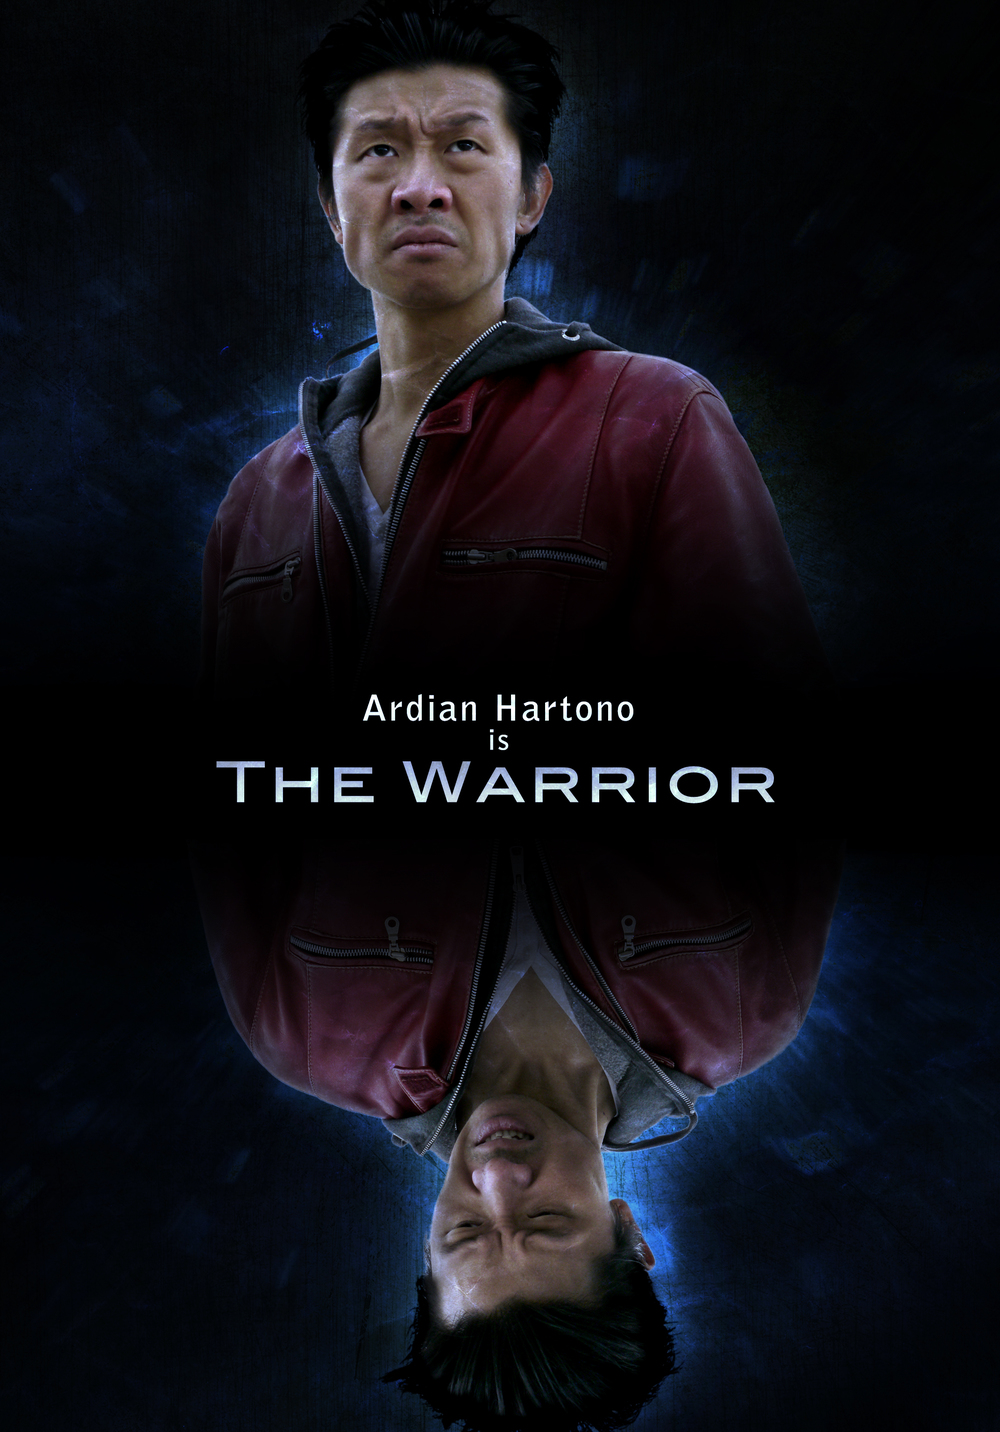 Ardian-poster3_05.jpg